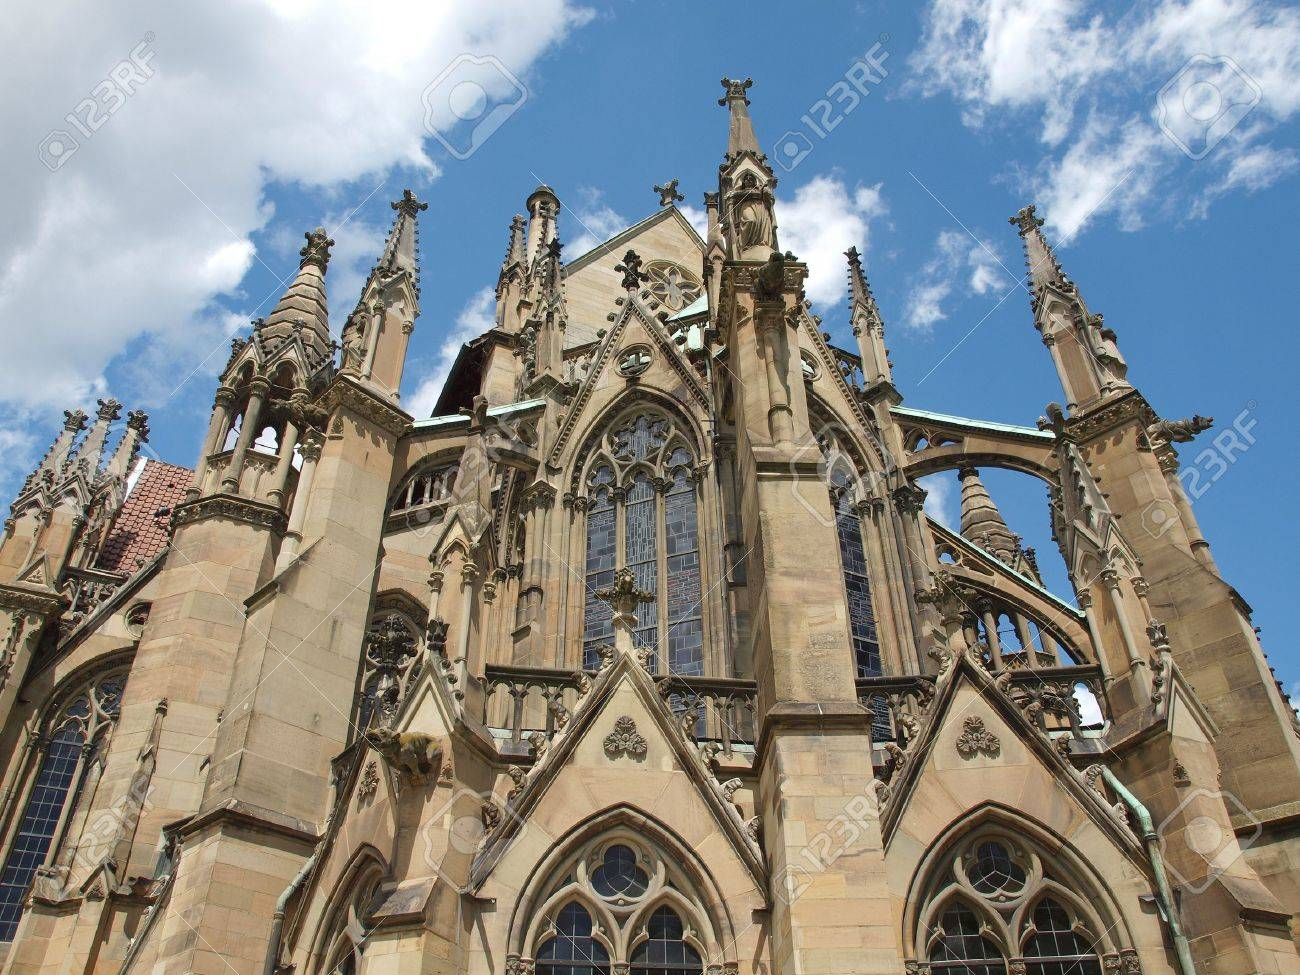 The Johanneskirche gothic church in Stuttgart, Germany Stock Photo - 14510793